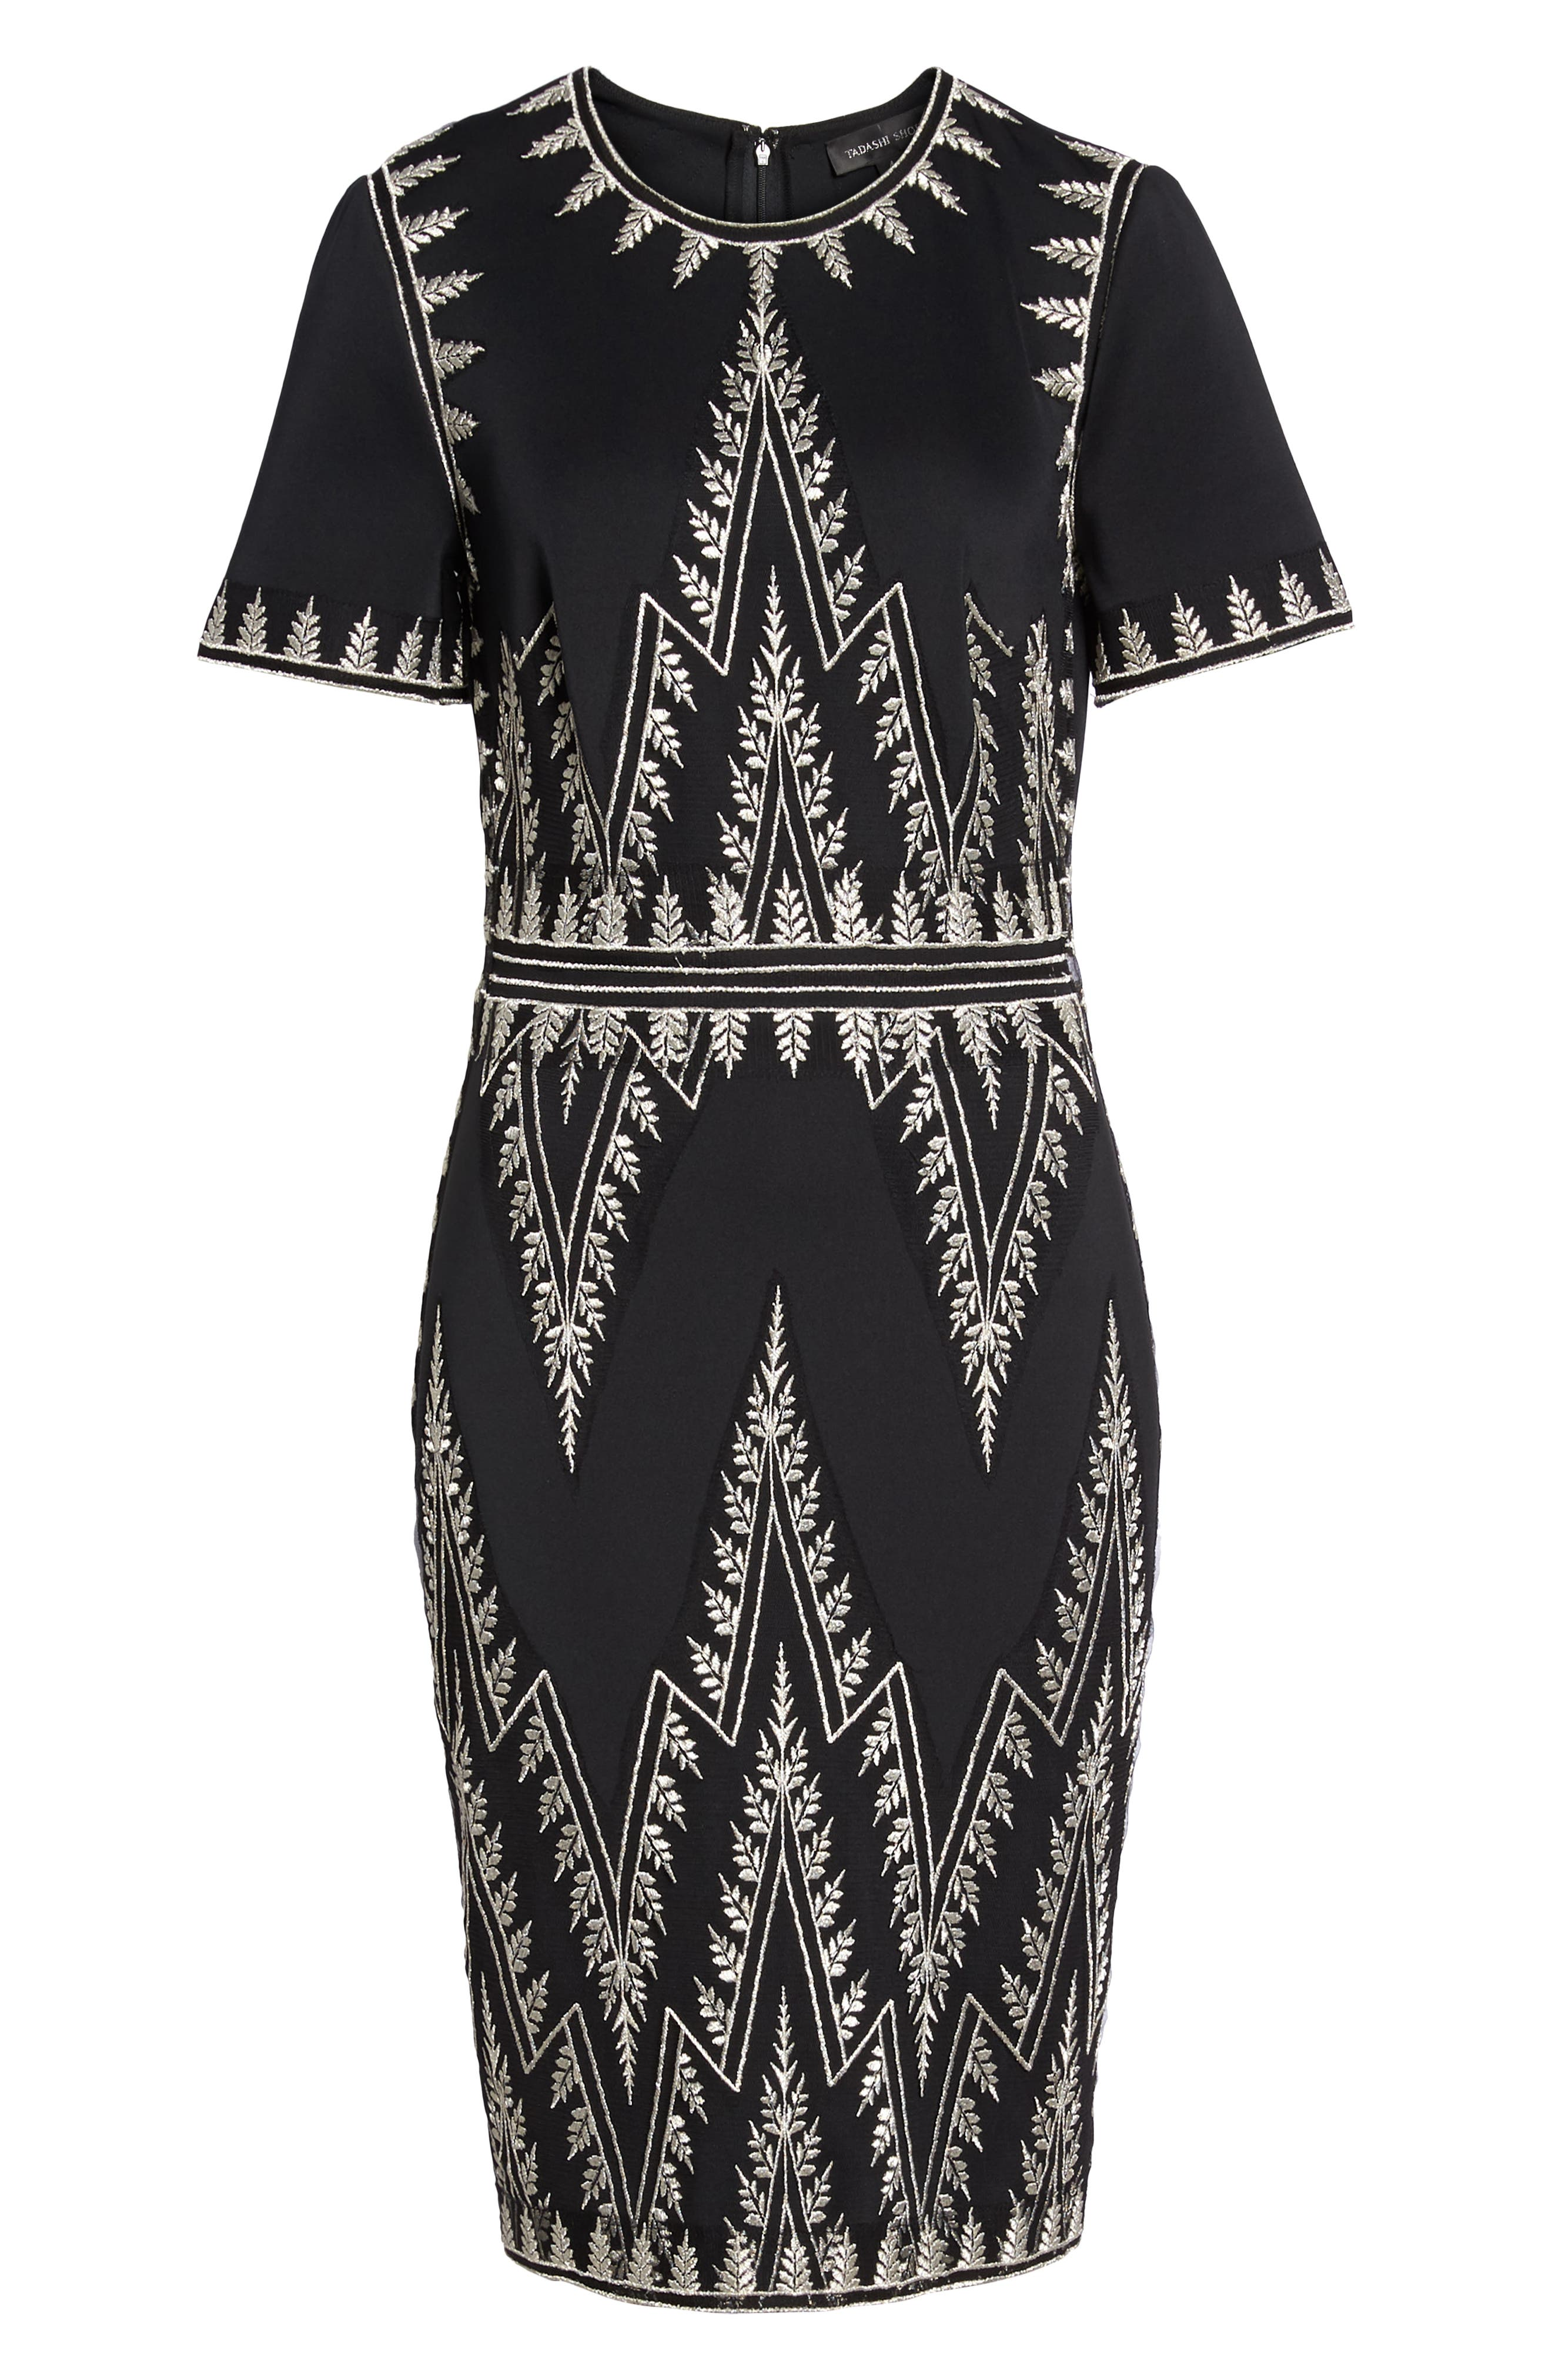 Embroidered Chevron Dress,                             Alternate thumbnail 6, color,                             BLACK/ SILVER